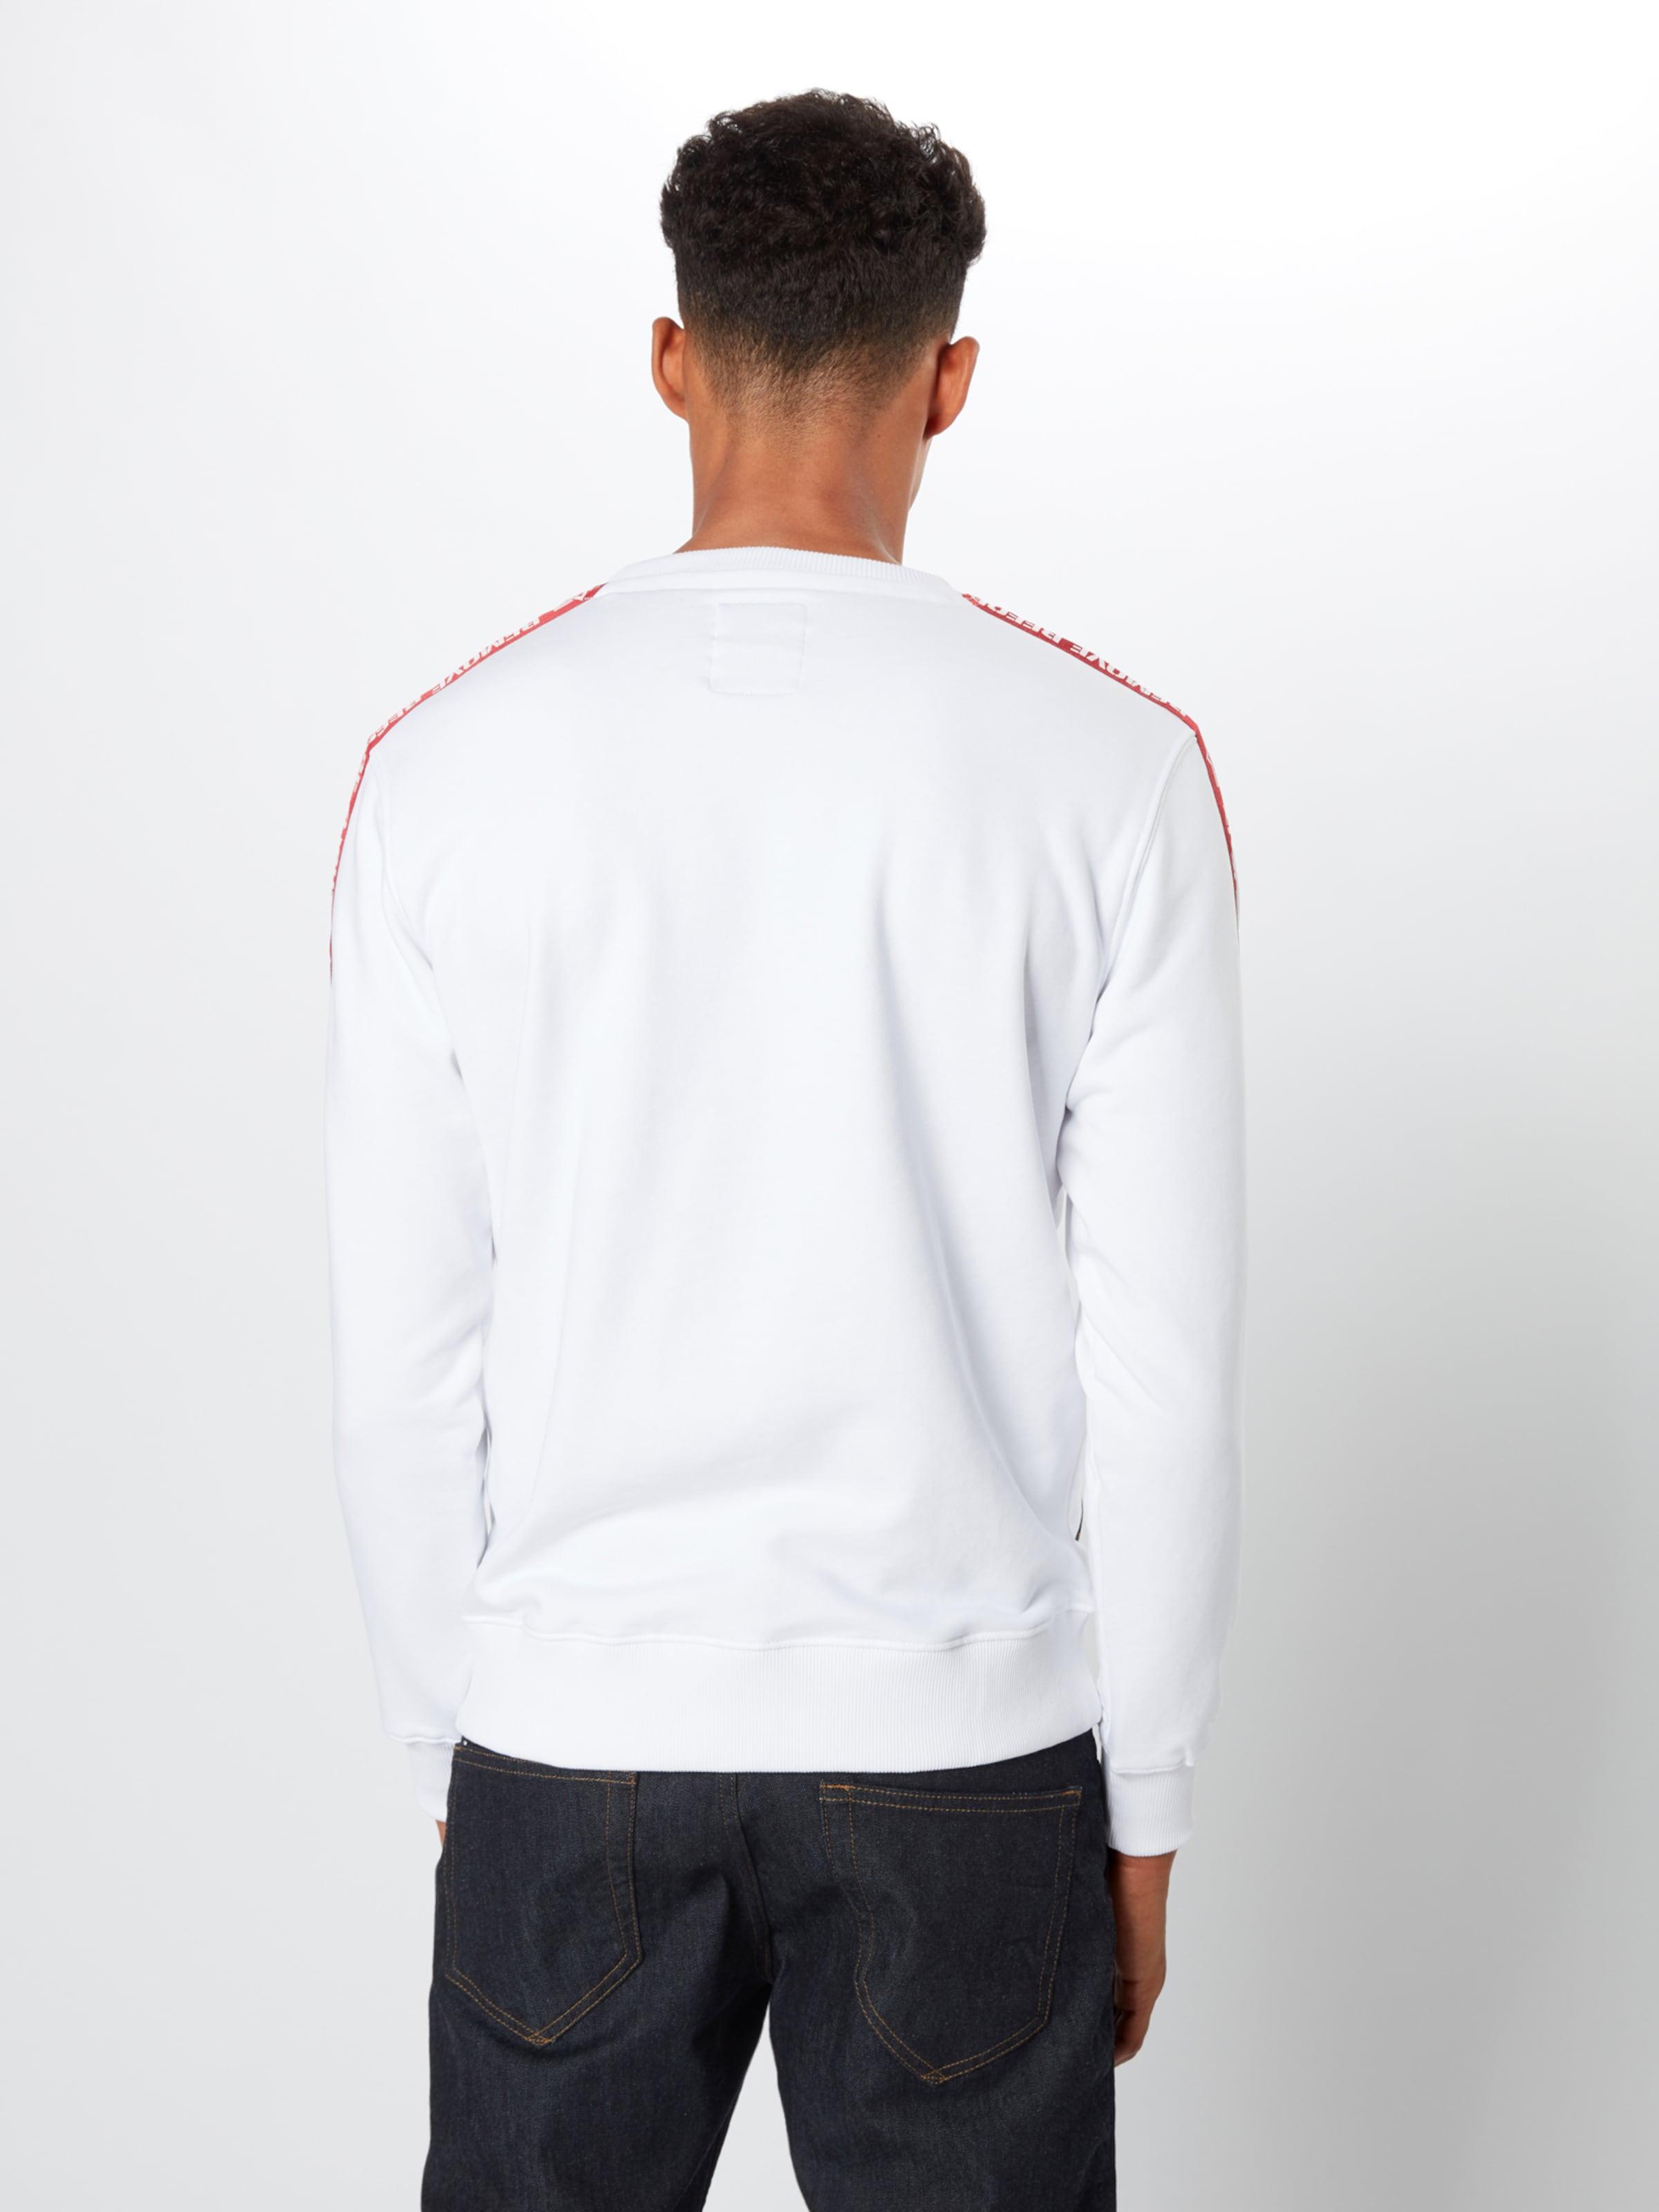 Alpha shirt Industries En Sweat RougeBlanc 3jR4A5L